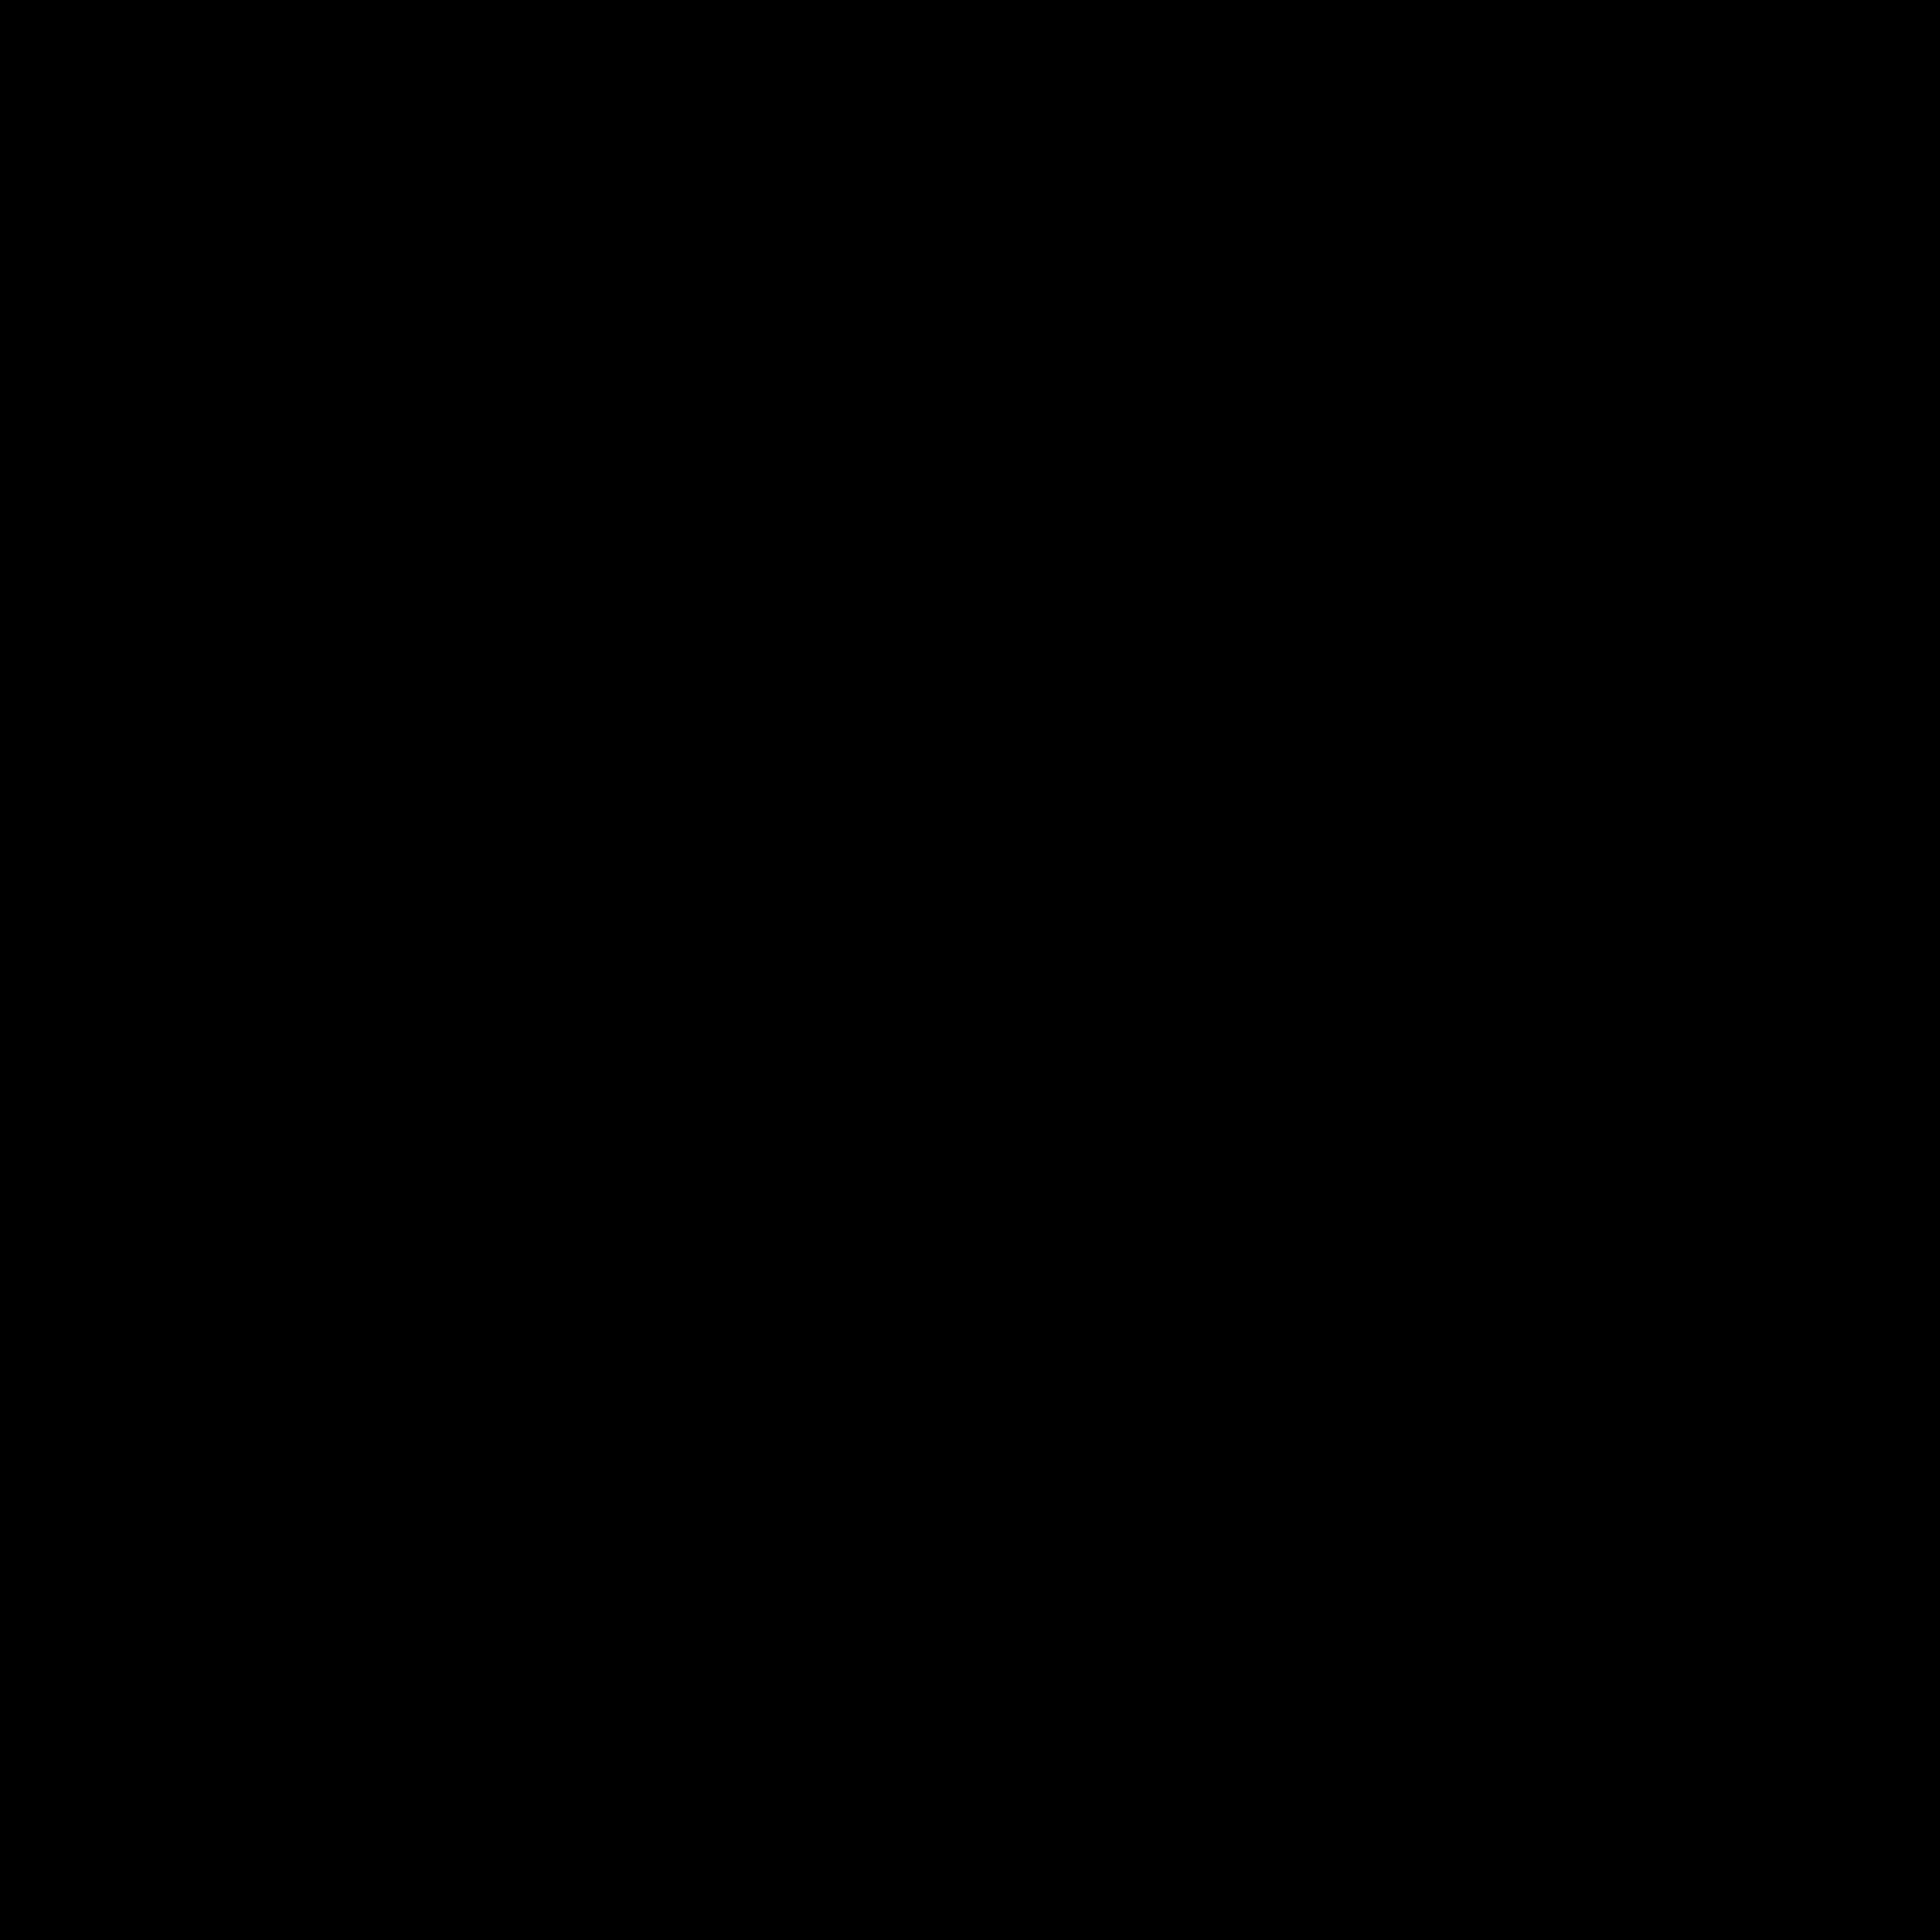 bonne-maman-logo-png-transparent.png